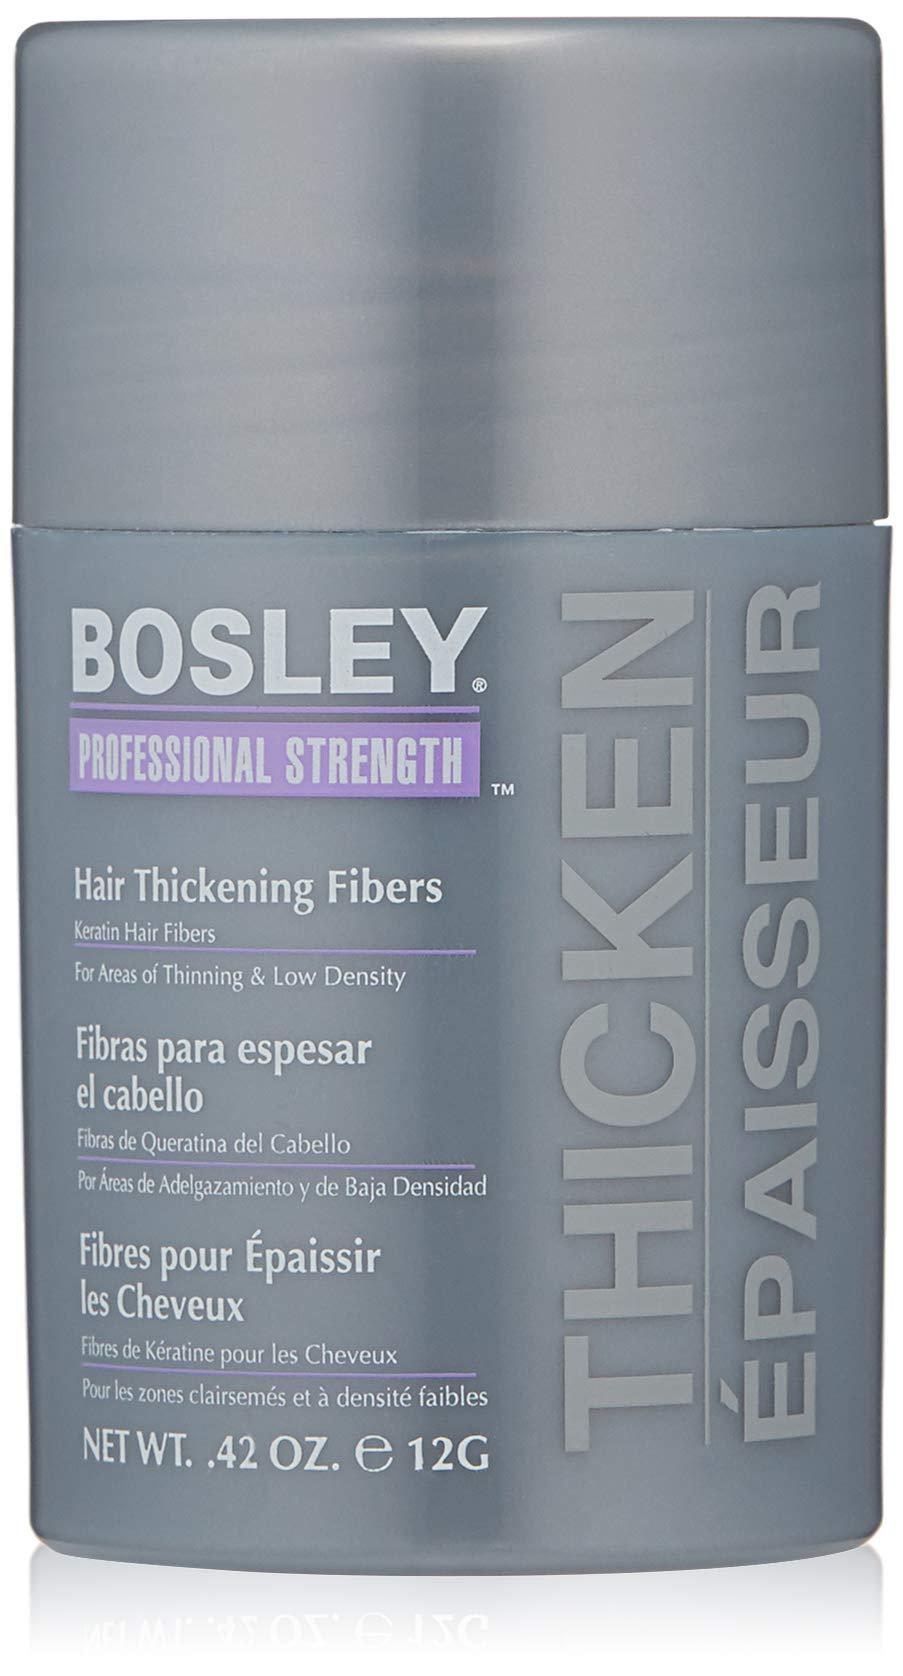 Bosley Professional Strength Hair Thickening Fibers, Dark Brown, 0.42 Ounce by Bosley Professional Strength